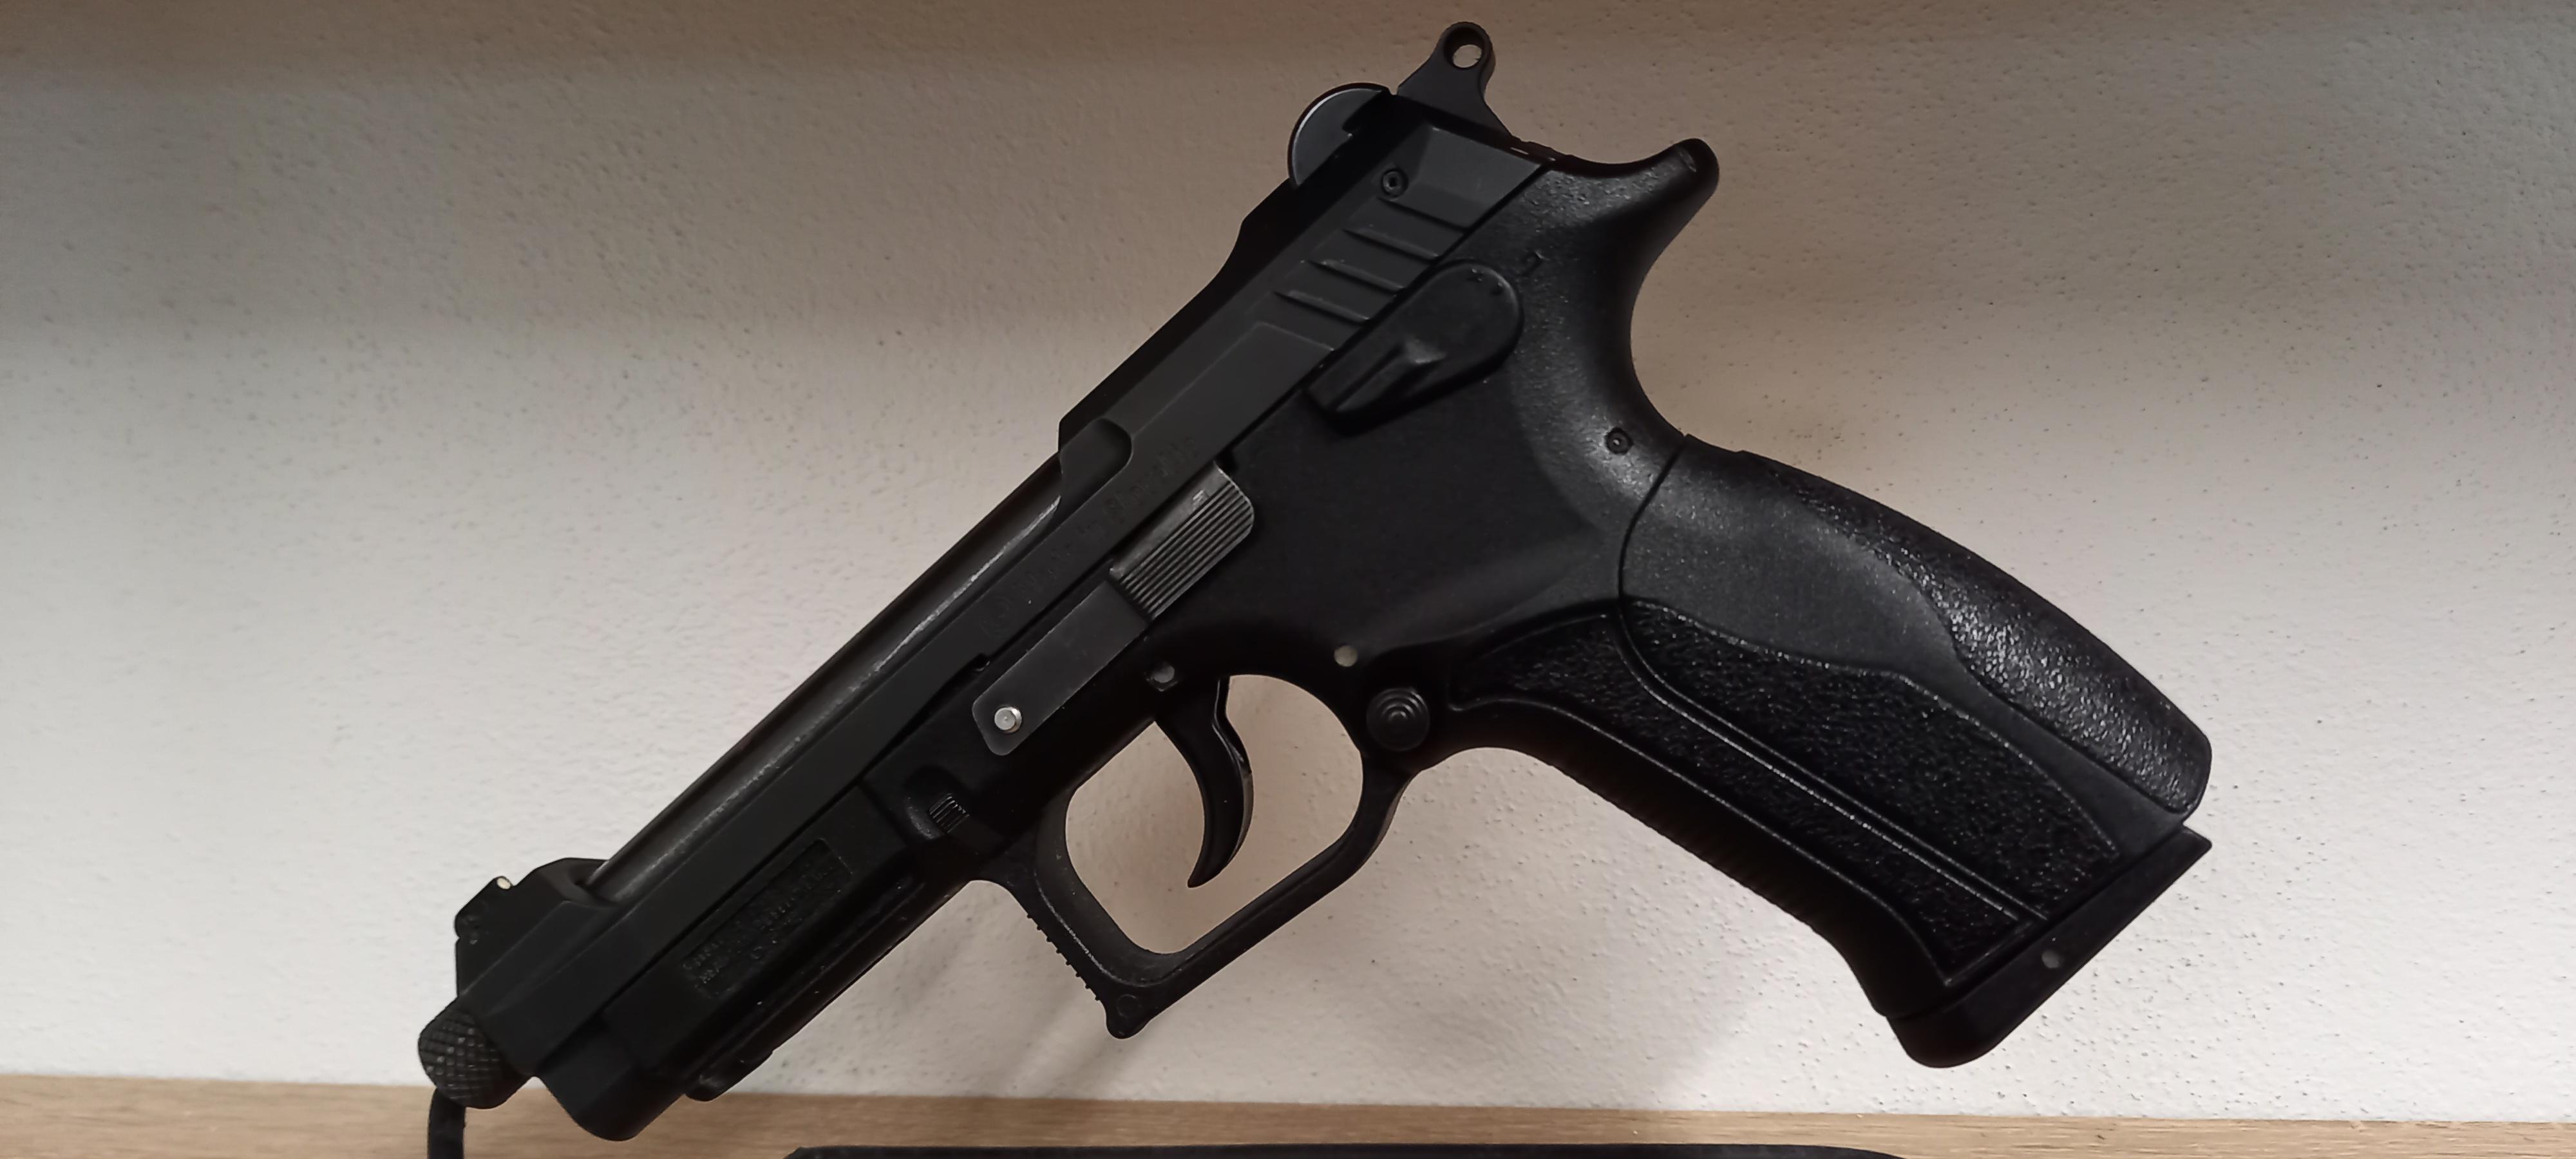 Pištoľ Grand Power K22 MK12/1, kal. 22 LR